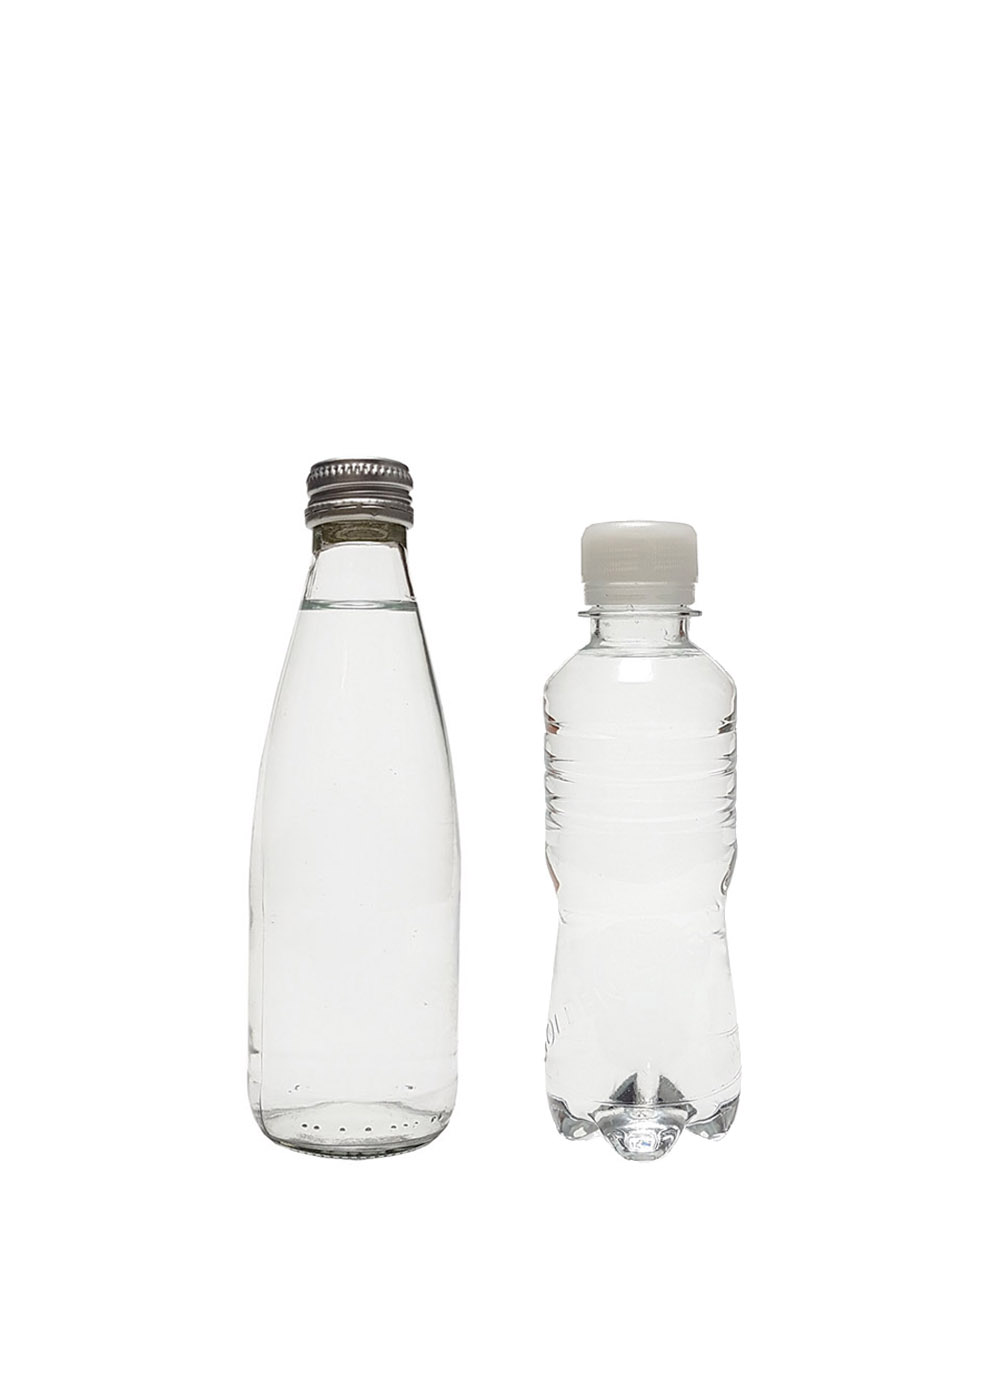 Steklo / PET Voda, Promovoda